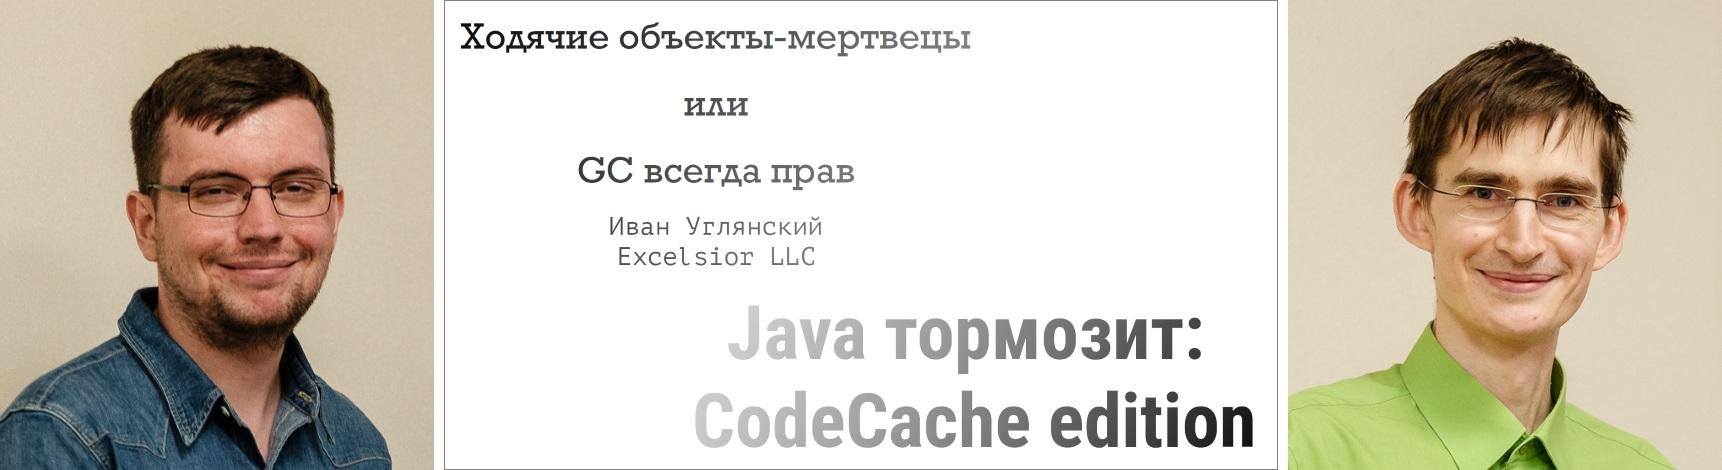 Иван Углянский и Владимир Ситников на jug.msk.ru